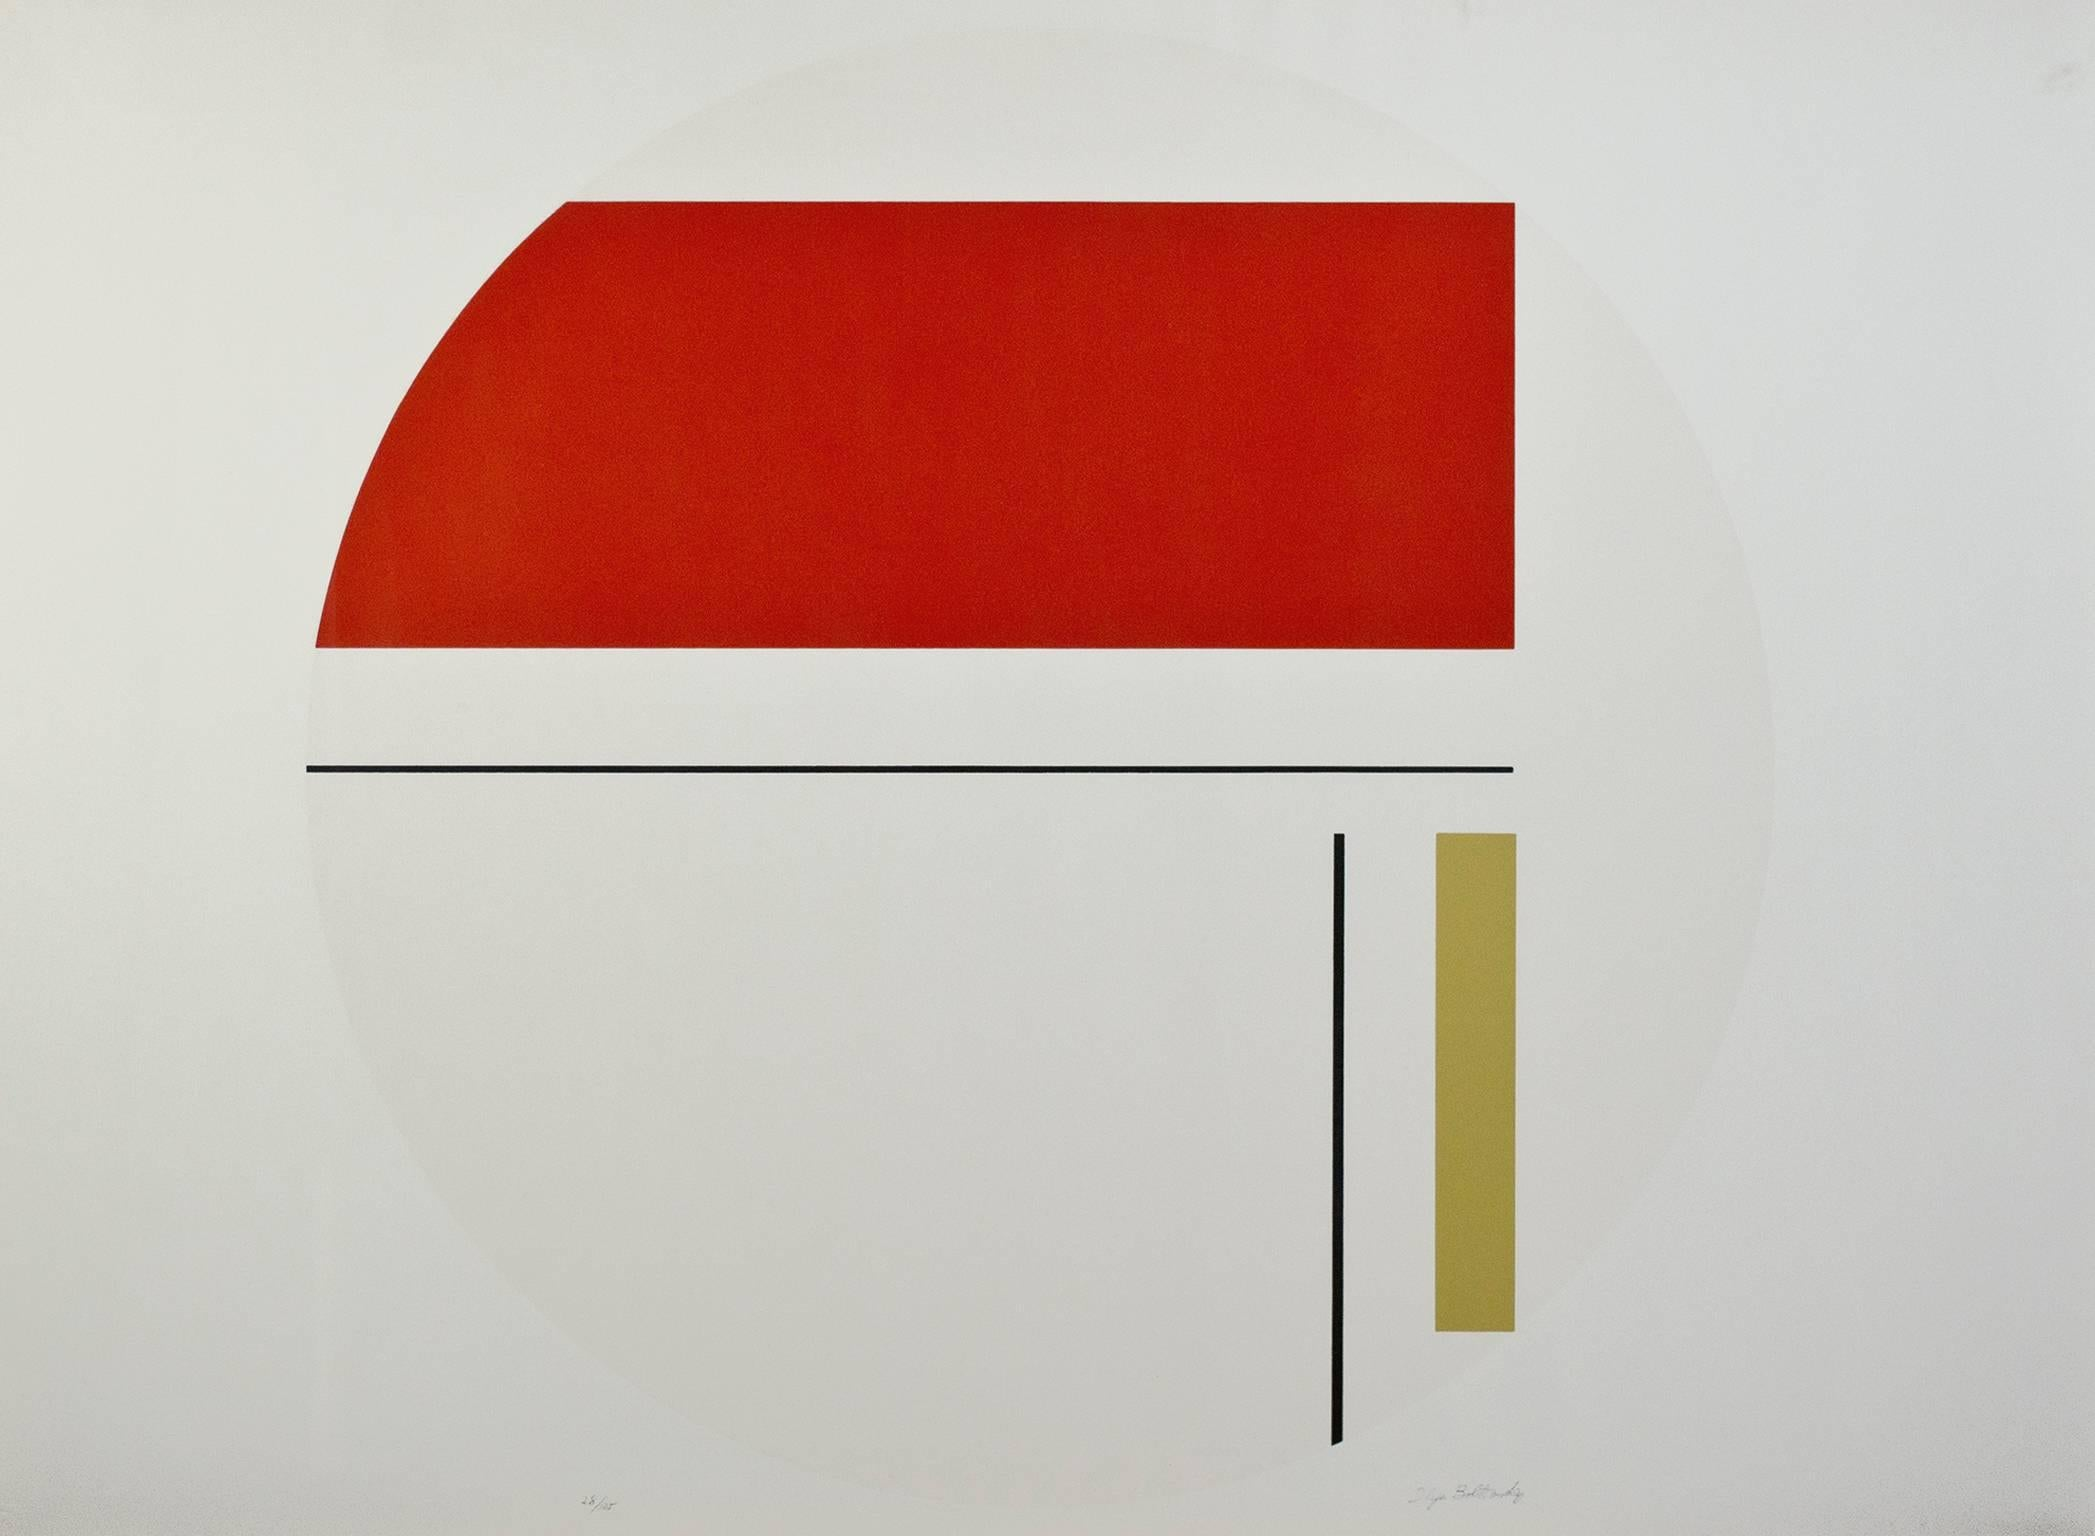 """Red & White Tondo,"" Silkscreen Geometric Print signed by Ilya Bolotowsky"